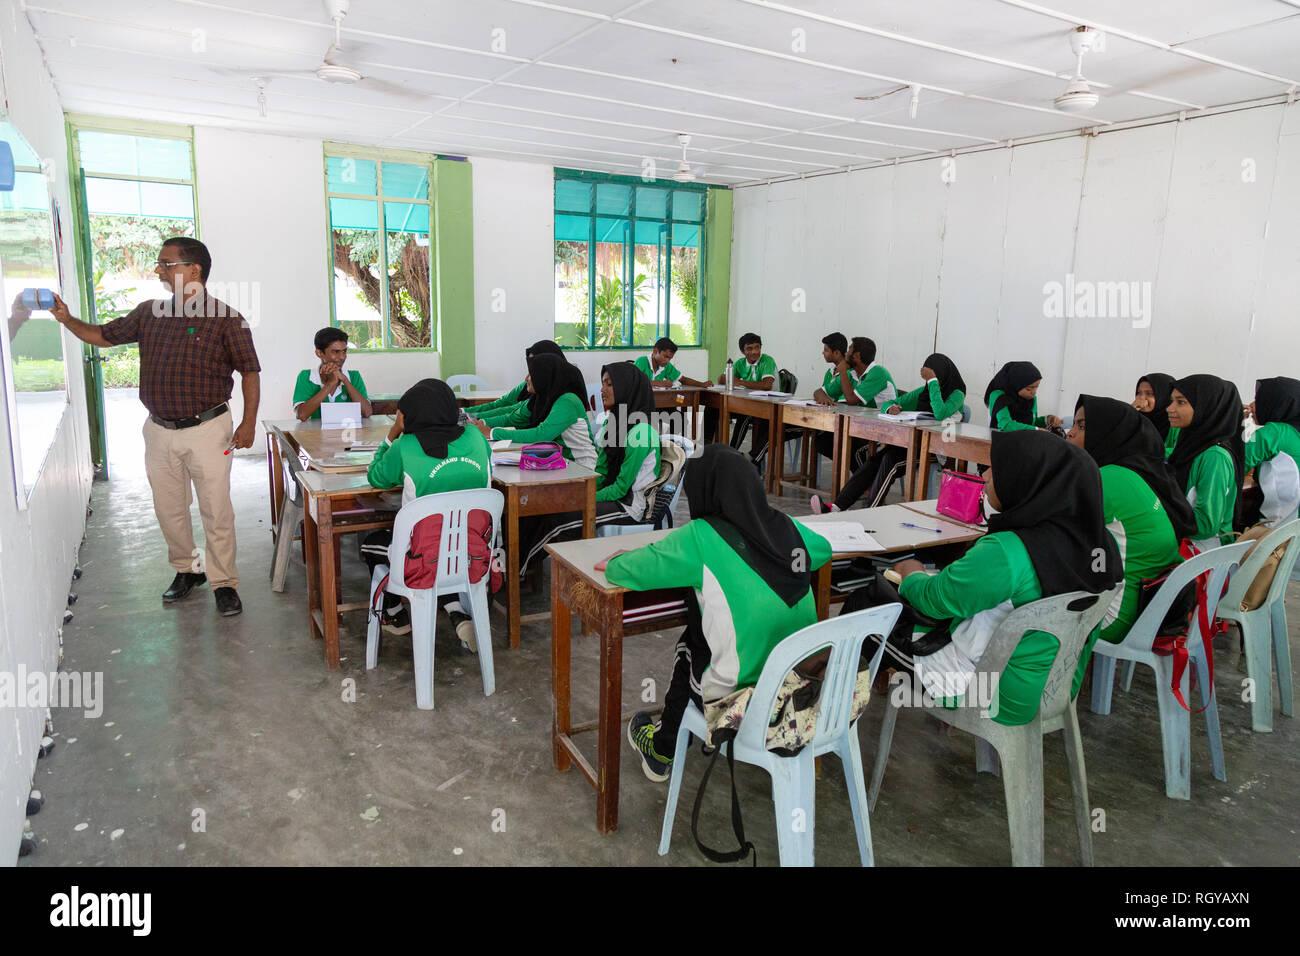 Asia school - a teacher teaching a class of secondary schoolchildren, Ukulhas Island, Alif Alif atoll, the Maldives, Asia - Stock Image